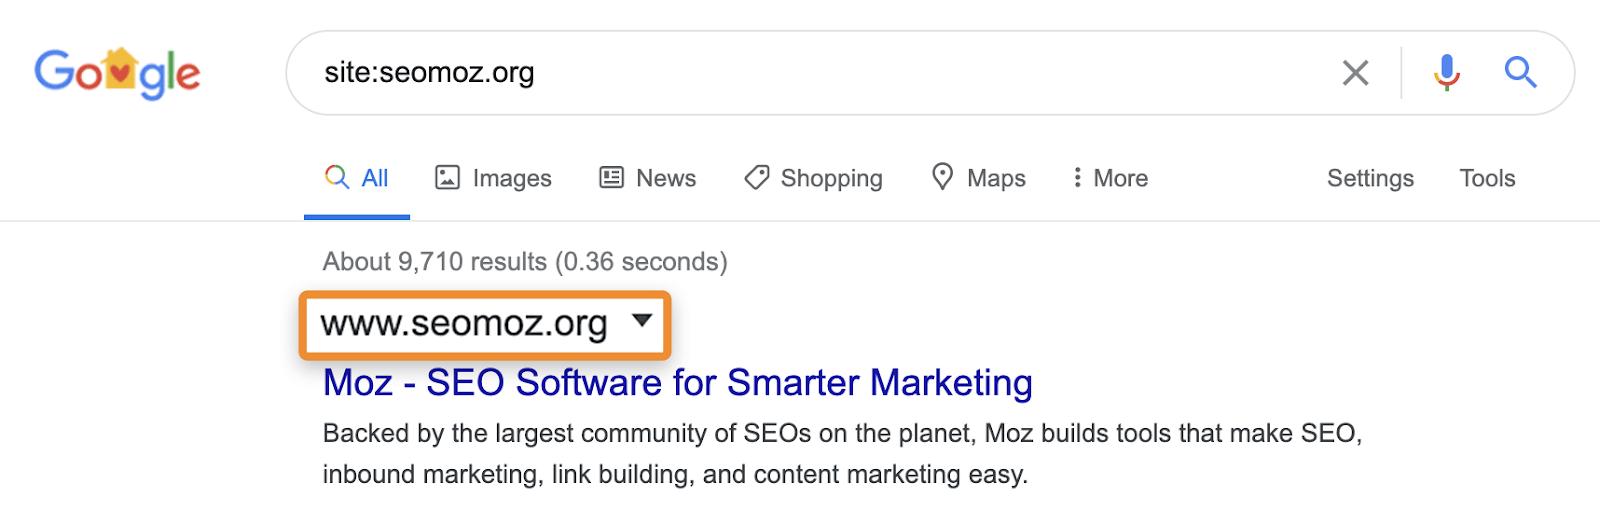 seomoz-site-search-serp-1